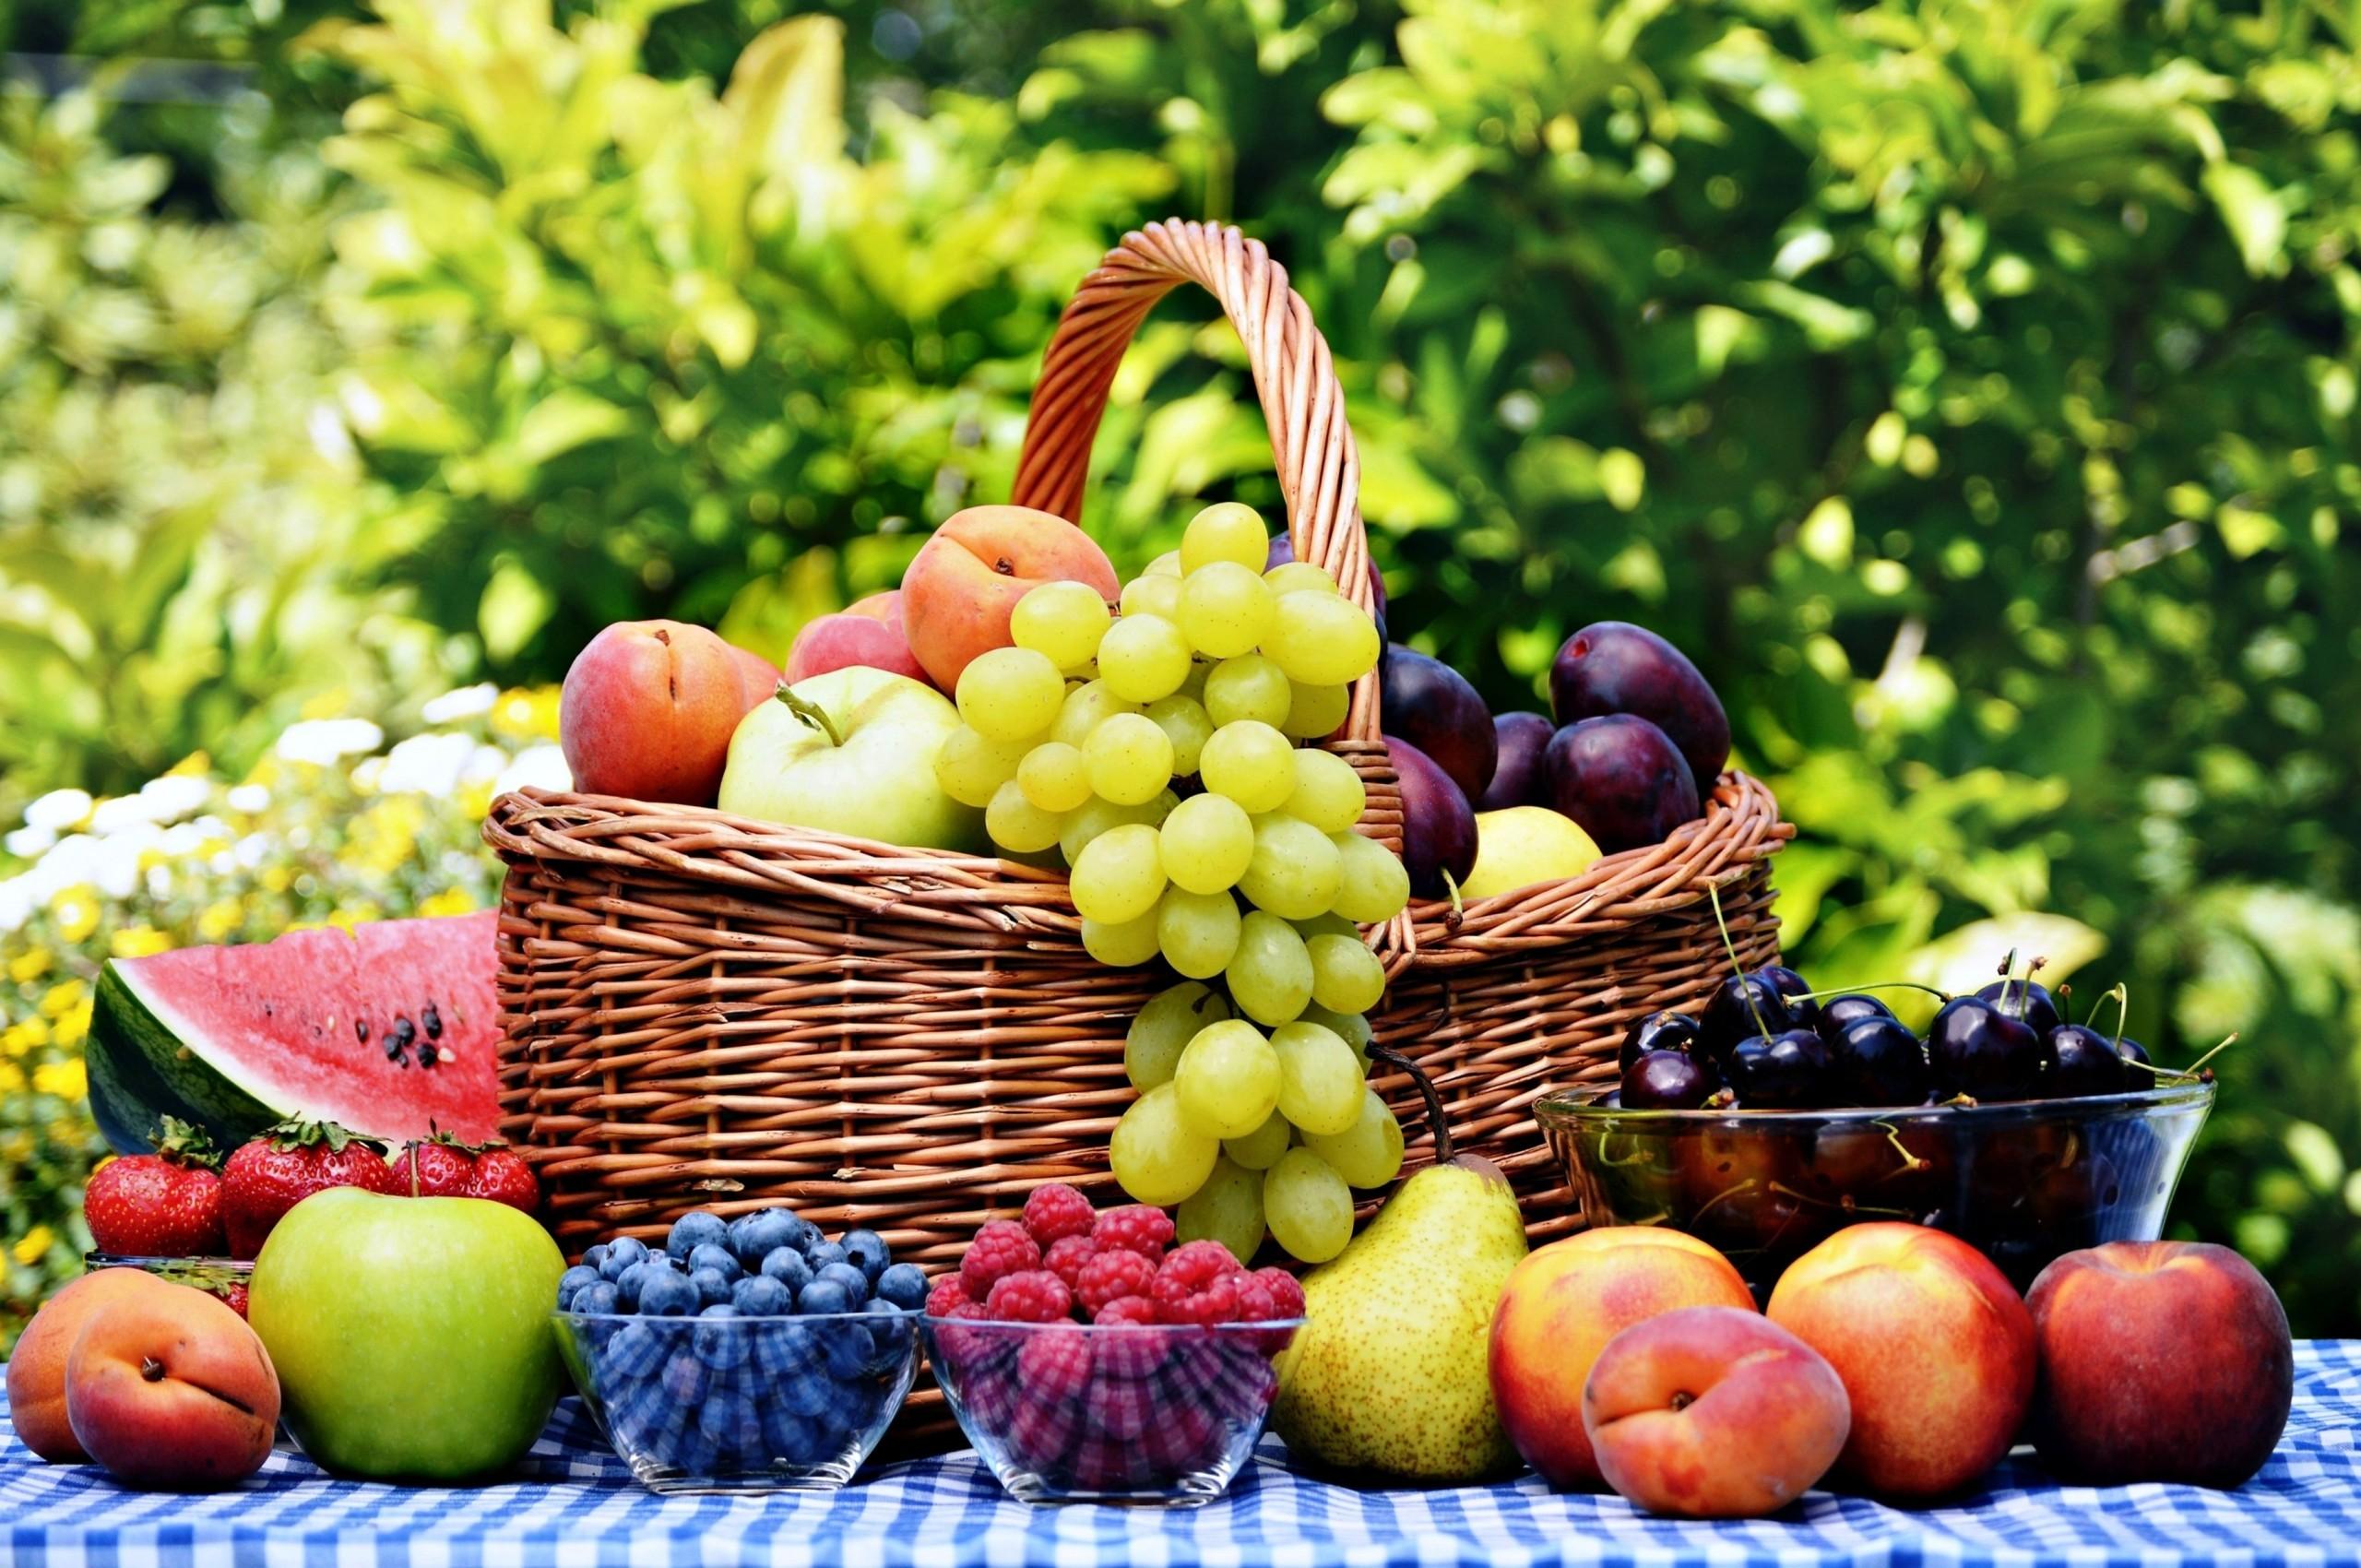 Res: 2560x1700, Fruit Basket, Grape, Apple, Peach, Berries